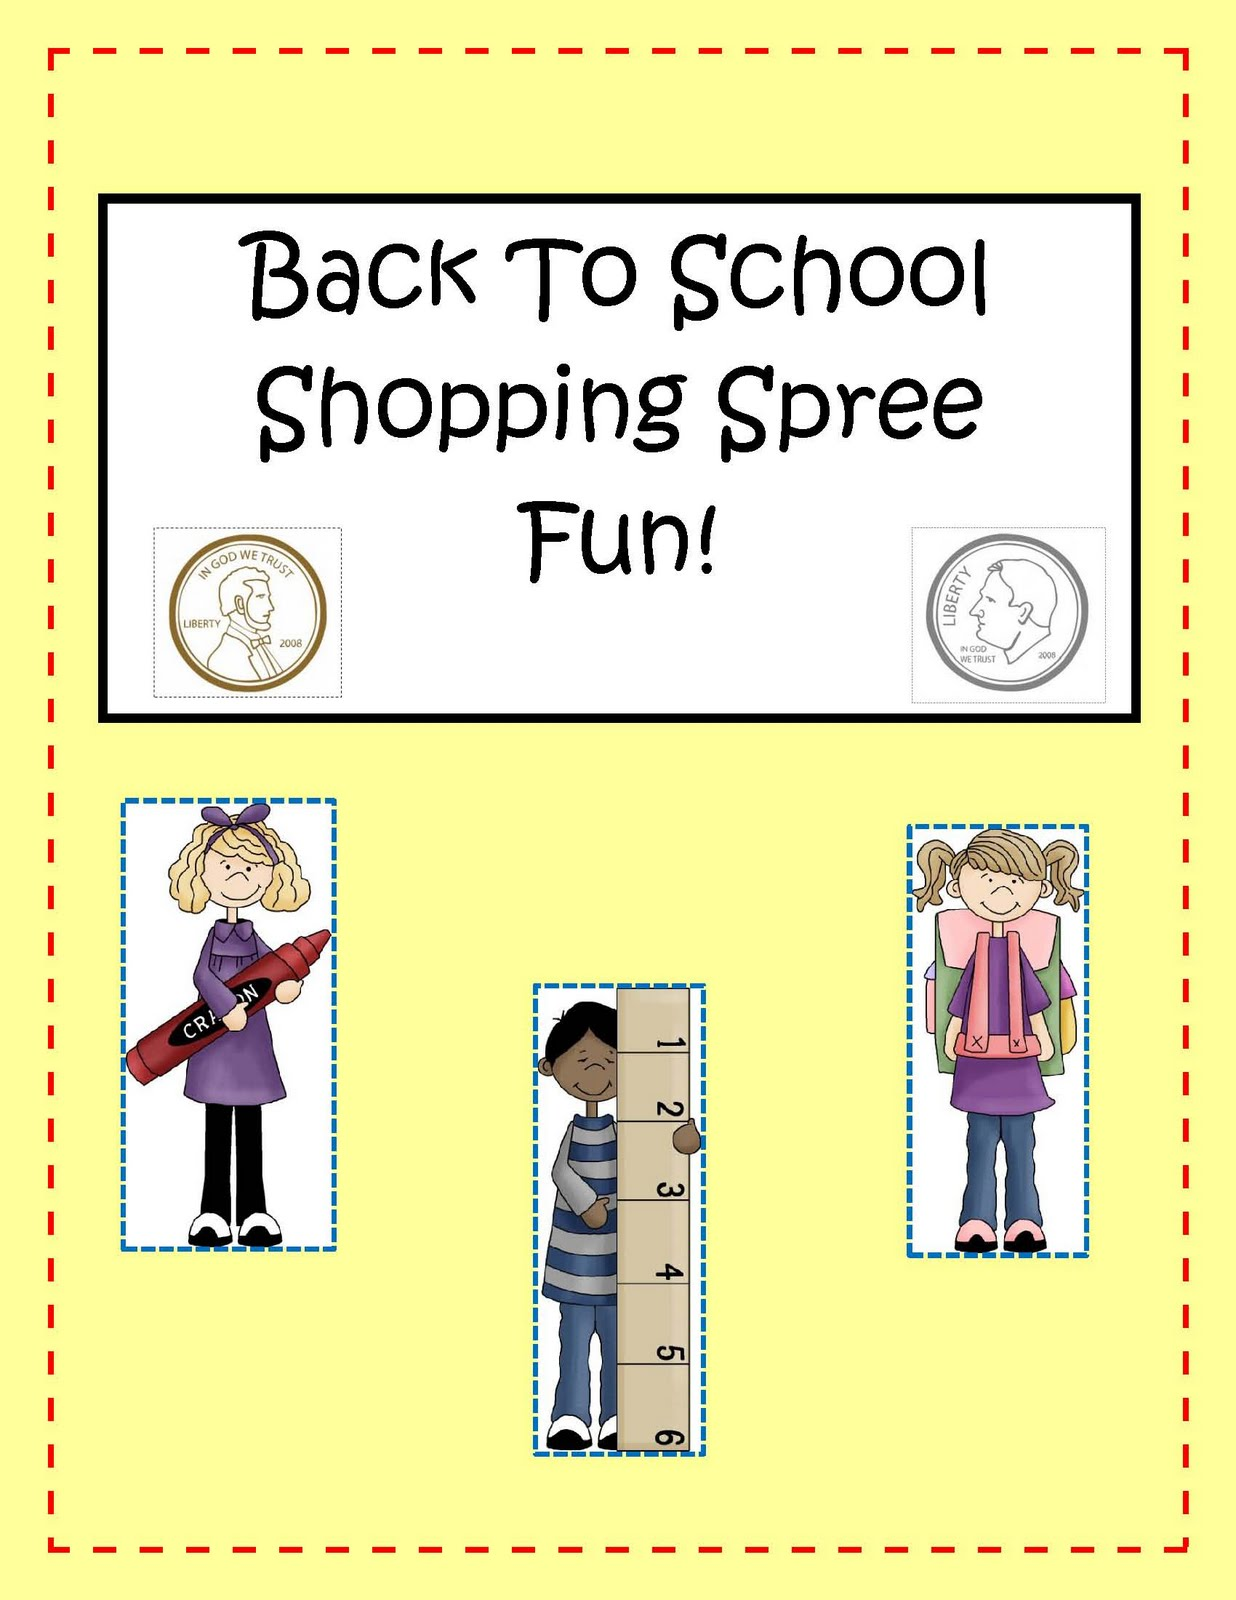 Little Miss Middle School Elementary Back To School